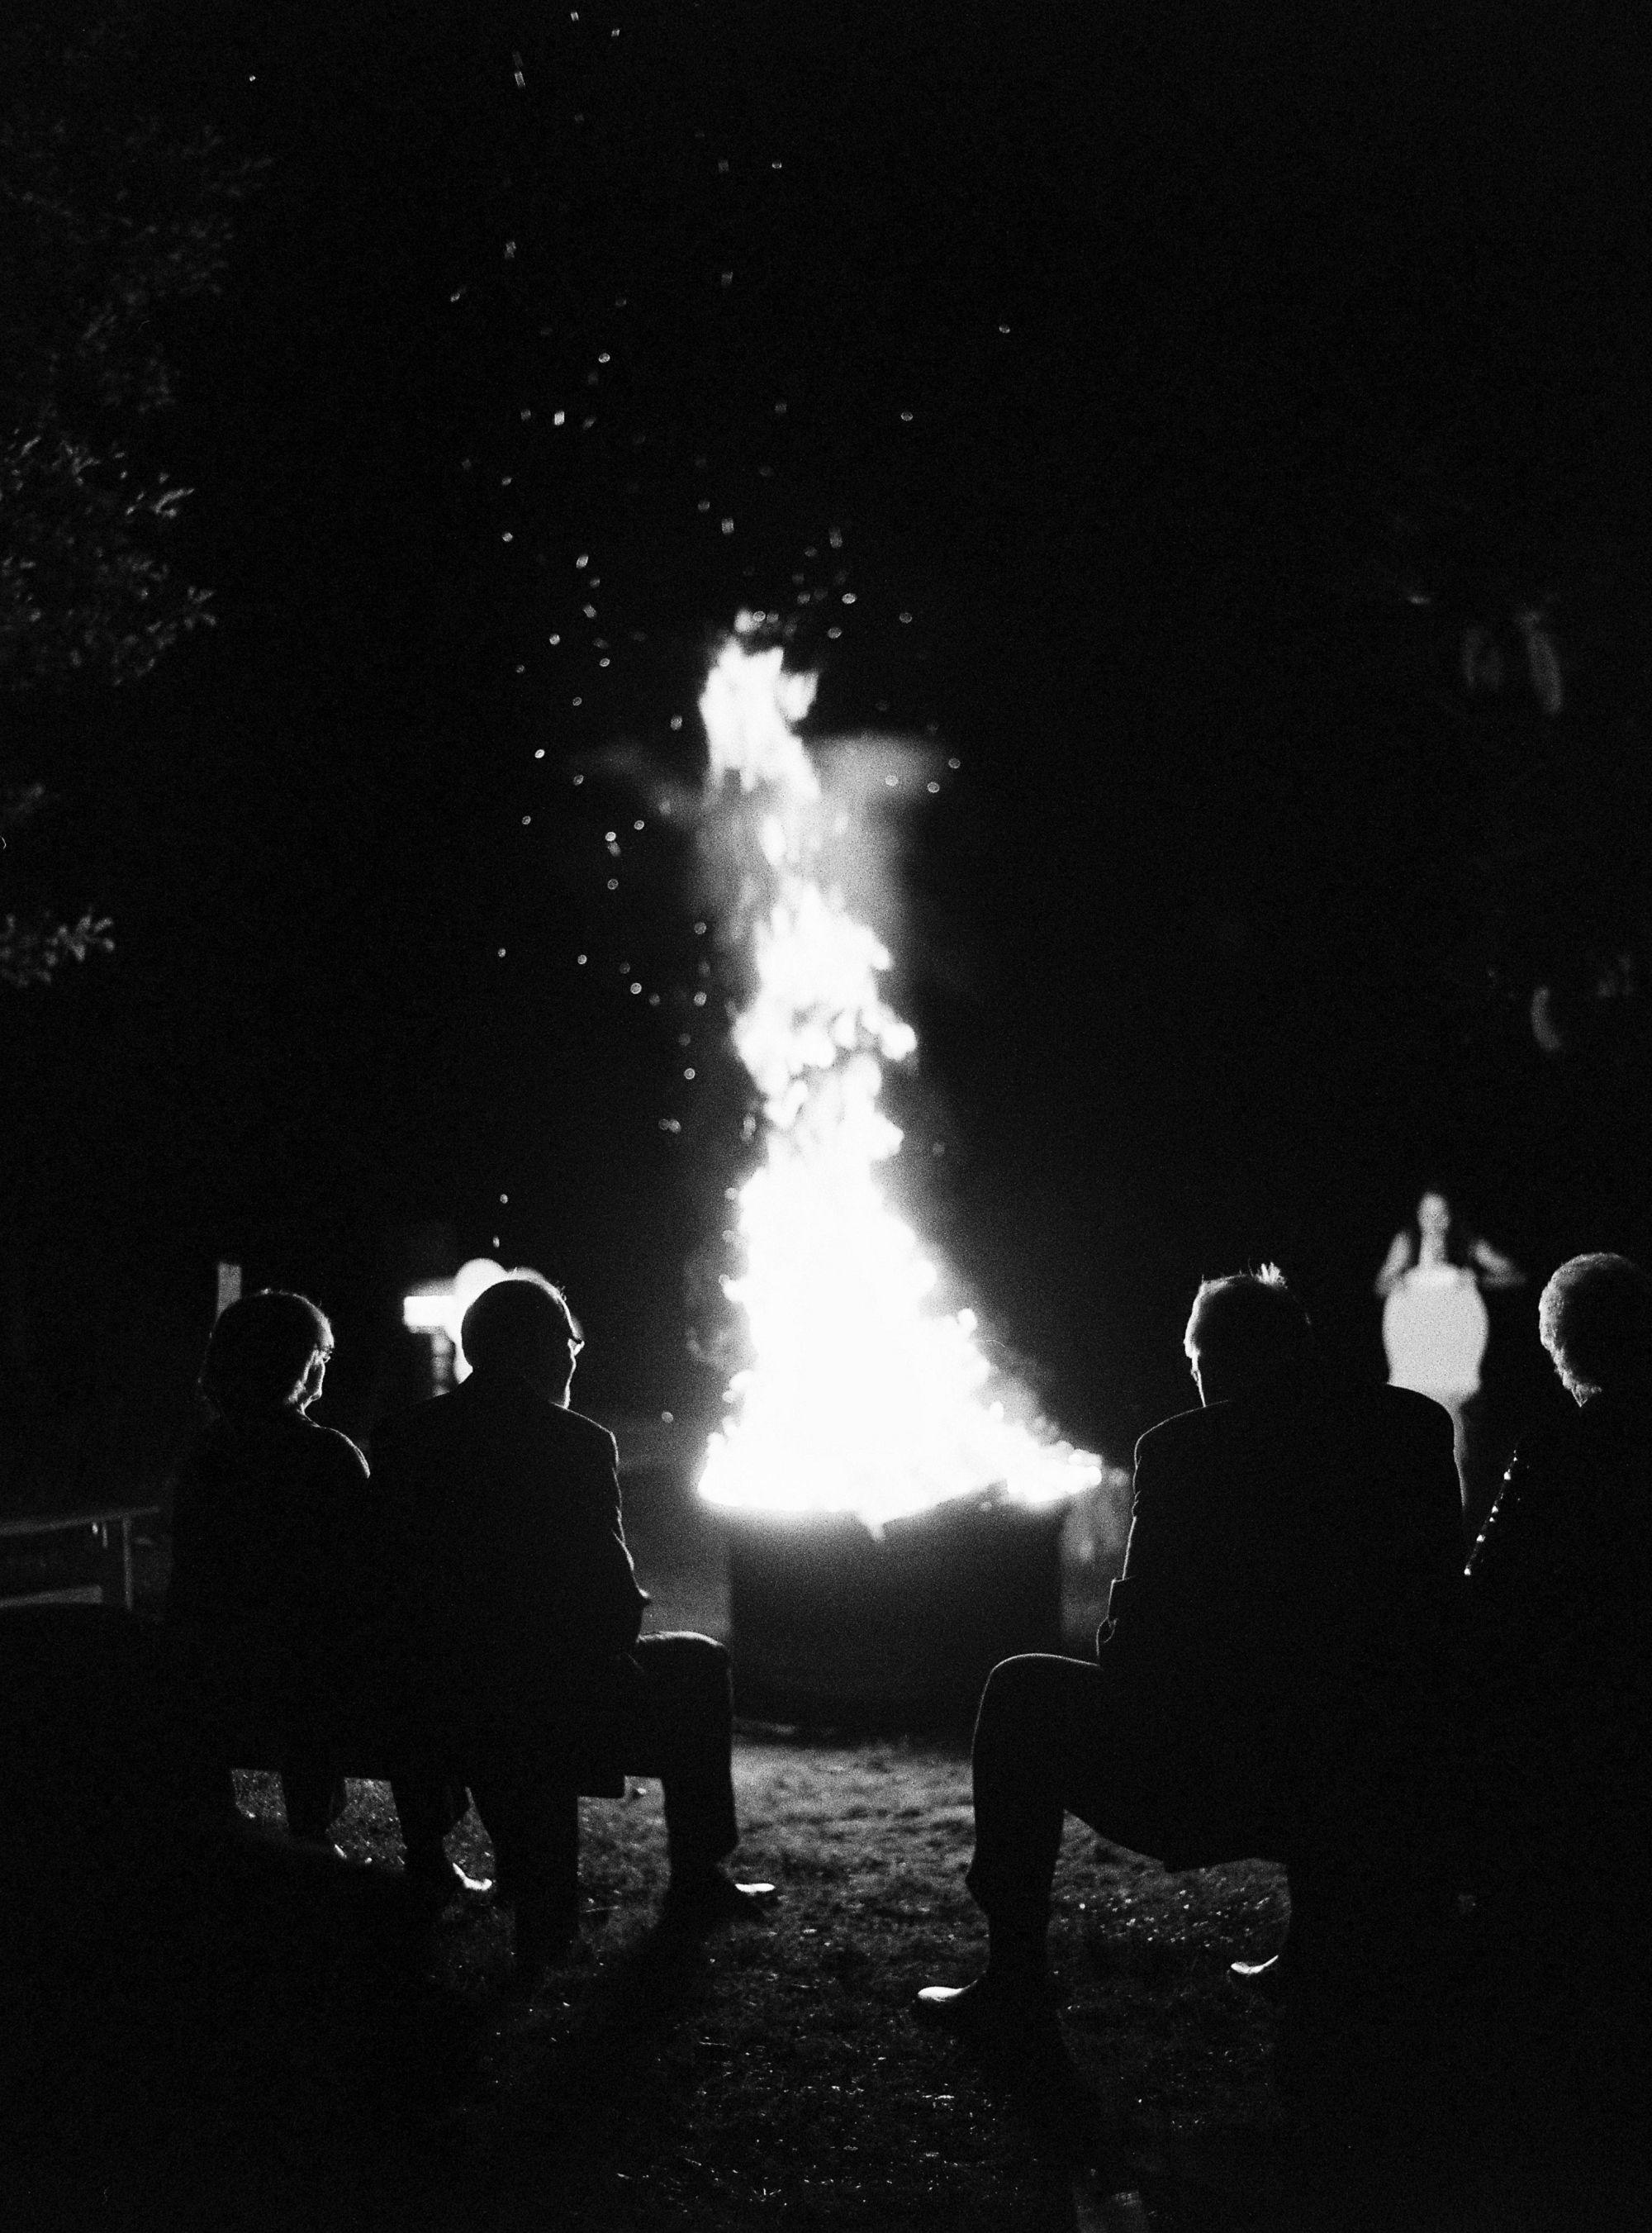 2000-katja-scherle-festtagsfotografien_berlin-hamburg-filmweddingphotographer-hochzeitsfotograf-rostock-mecklenburg_0061